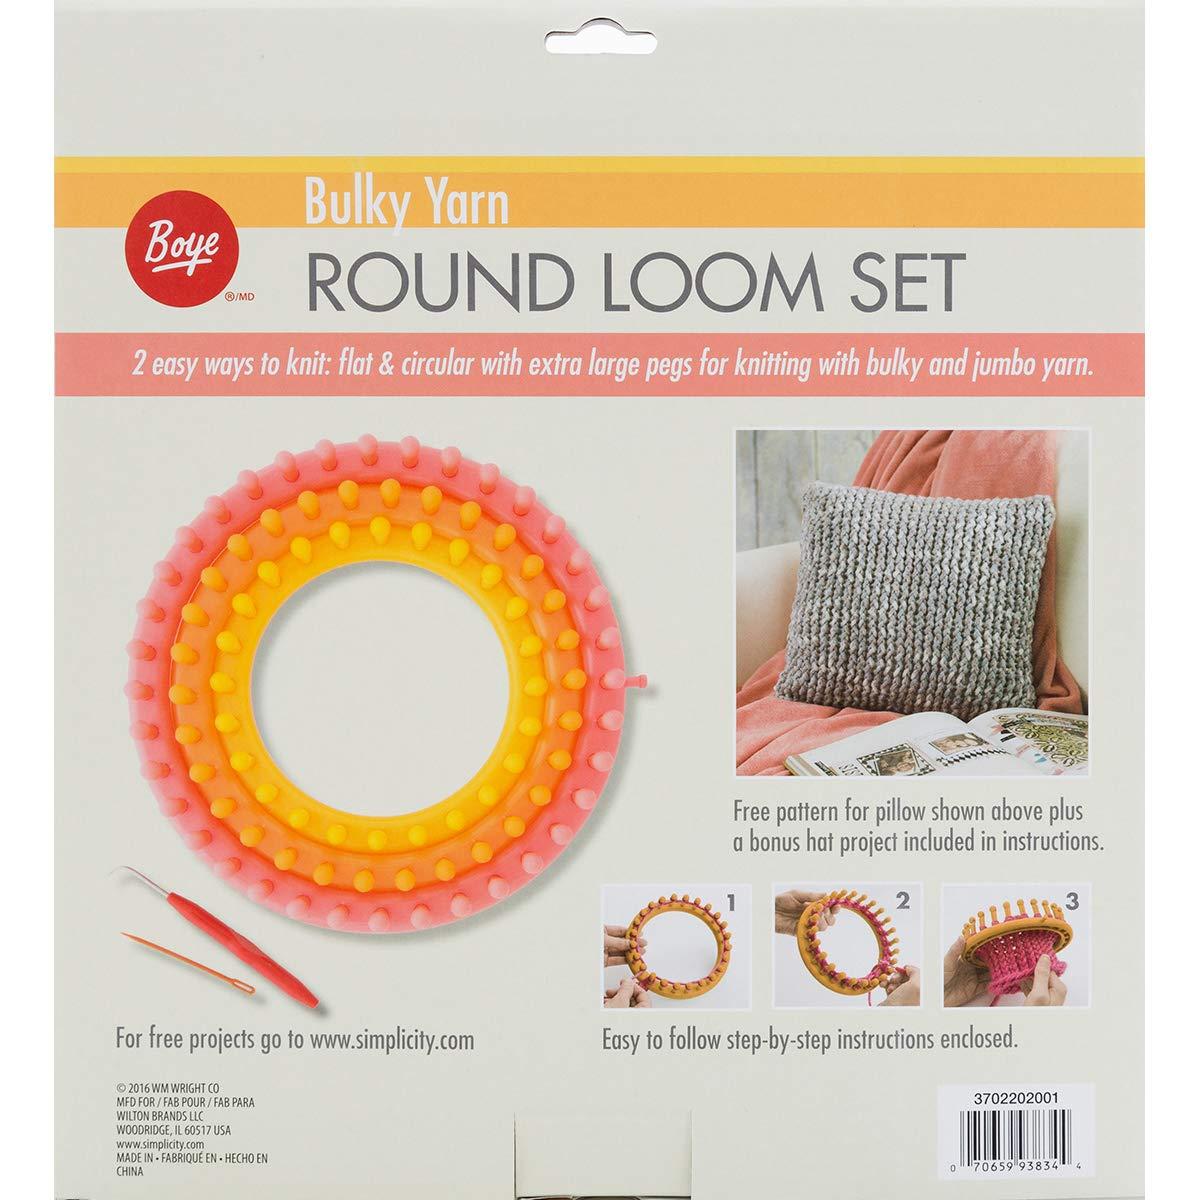 Boye Circular voluminosos Loom Set, Lime, 14 x 5 x 5 cm ...